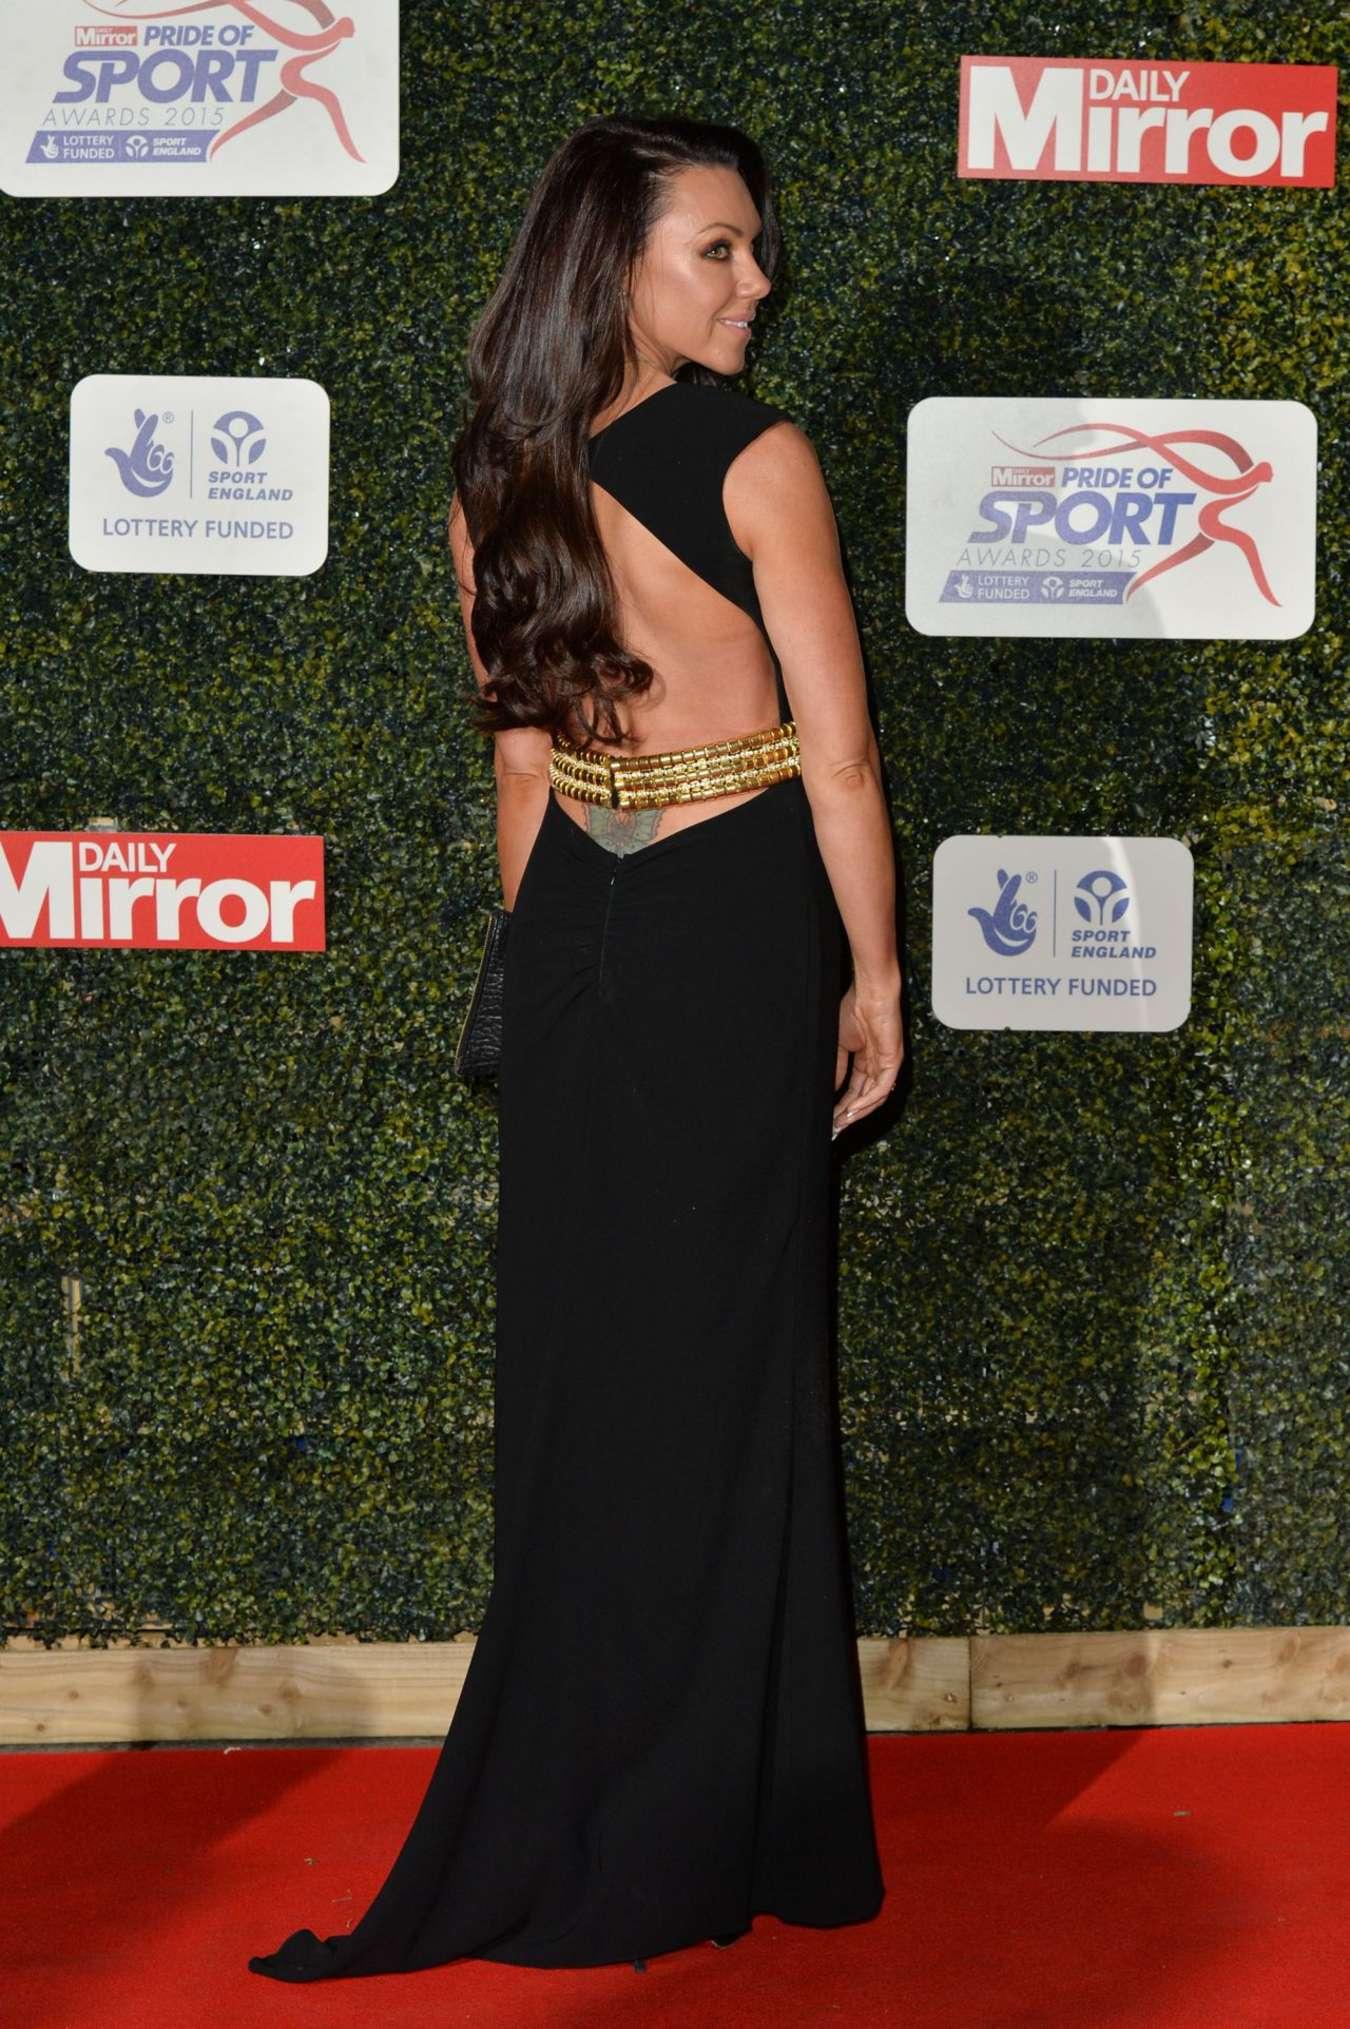 Michelle Heaton Daily Mirror Pride of Sport Awards in London